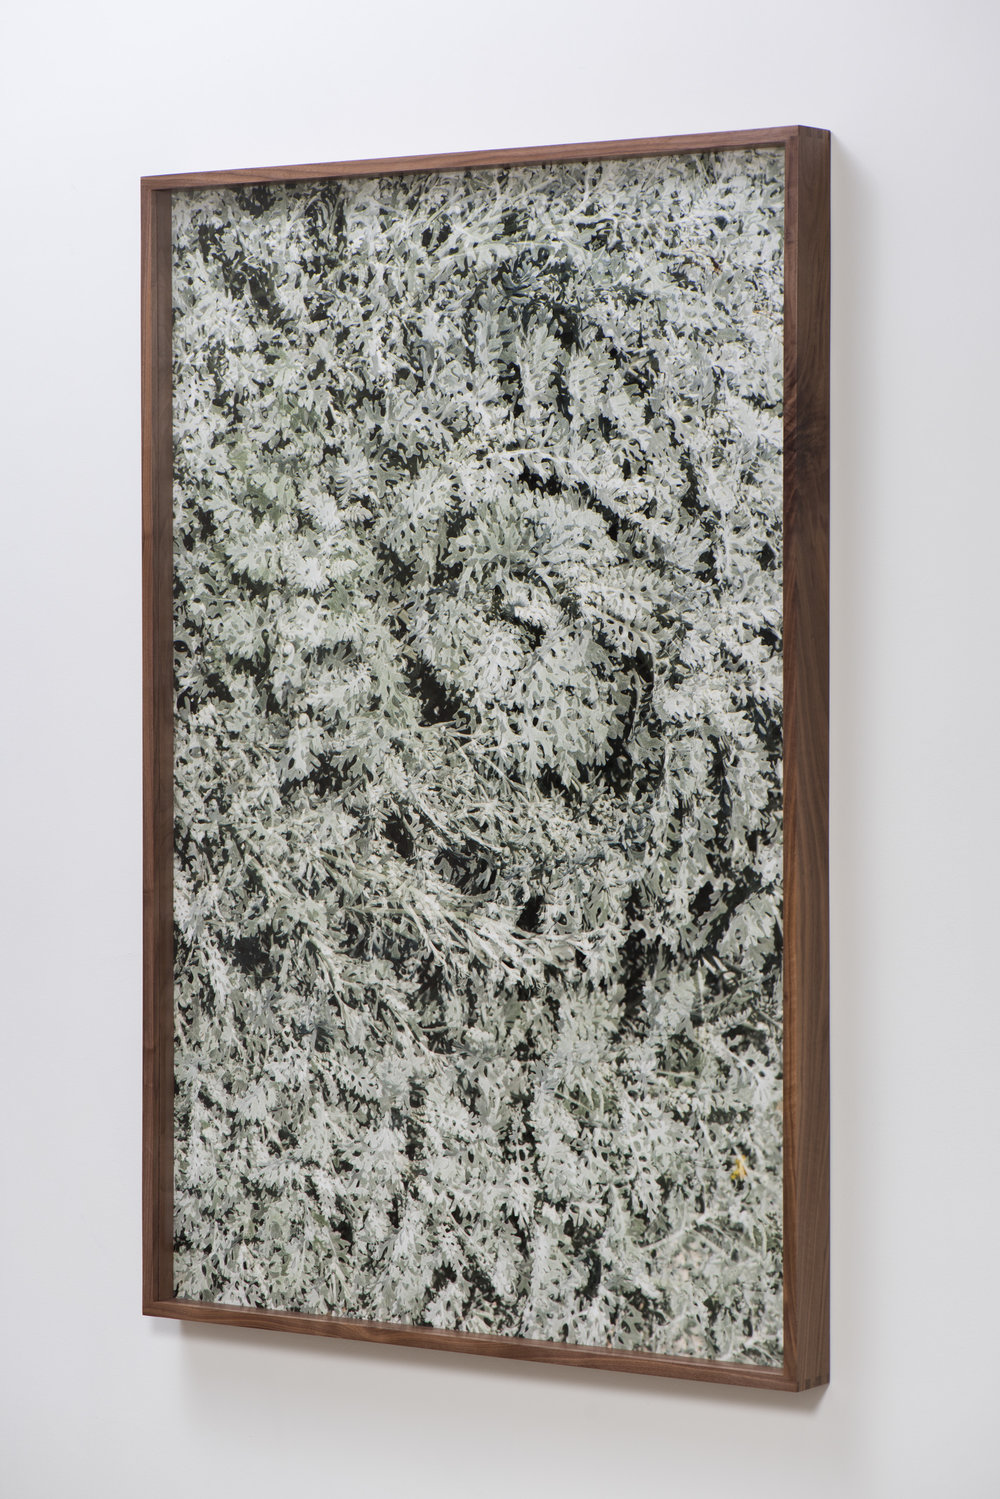 Spiral II,  2017 (oblique) Archival pigment print 60x40 Inches